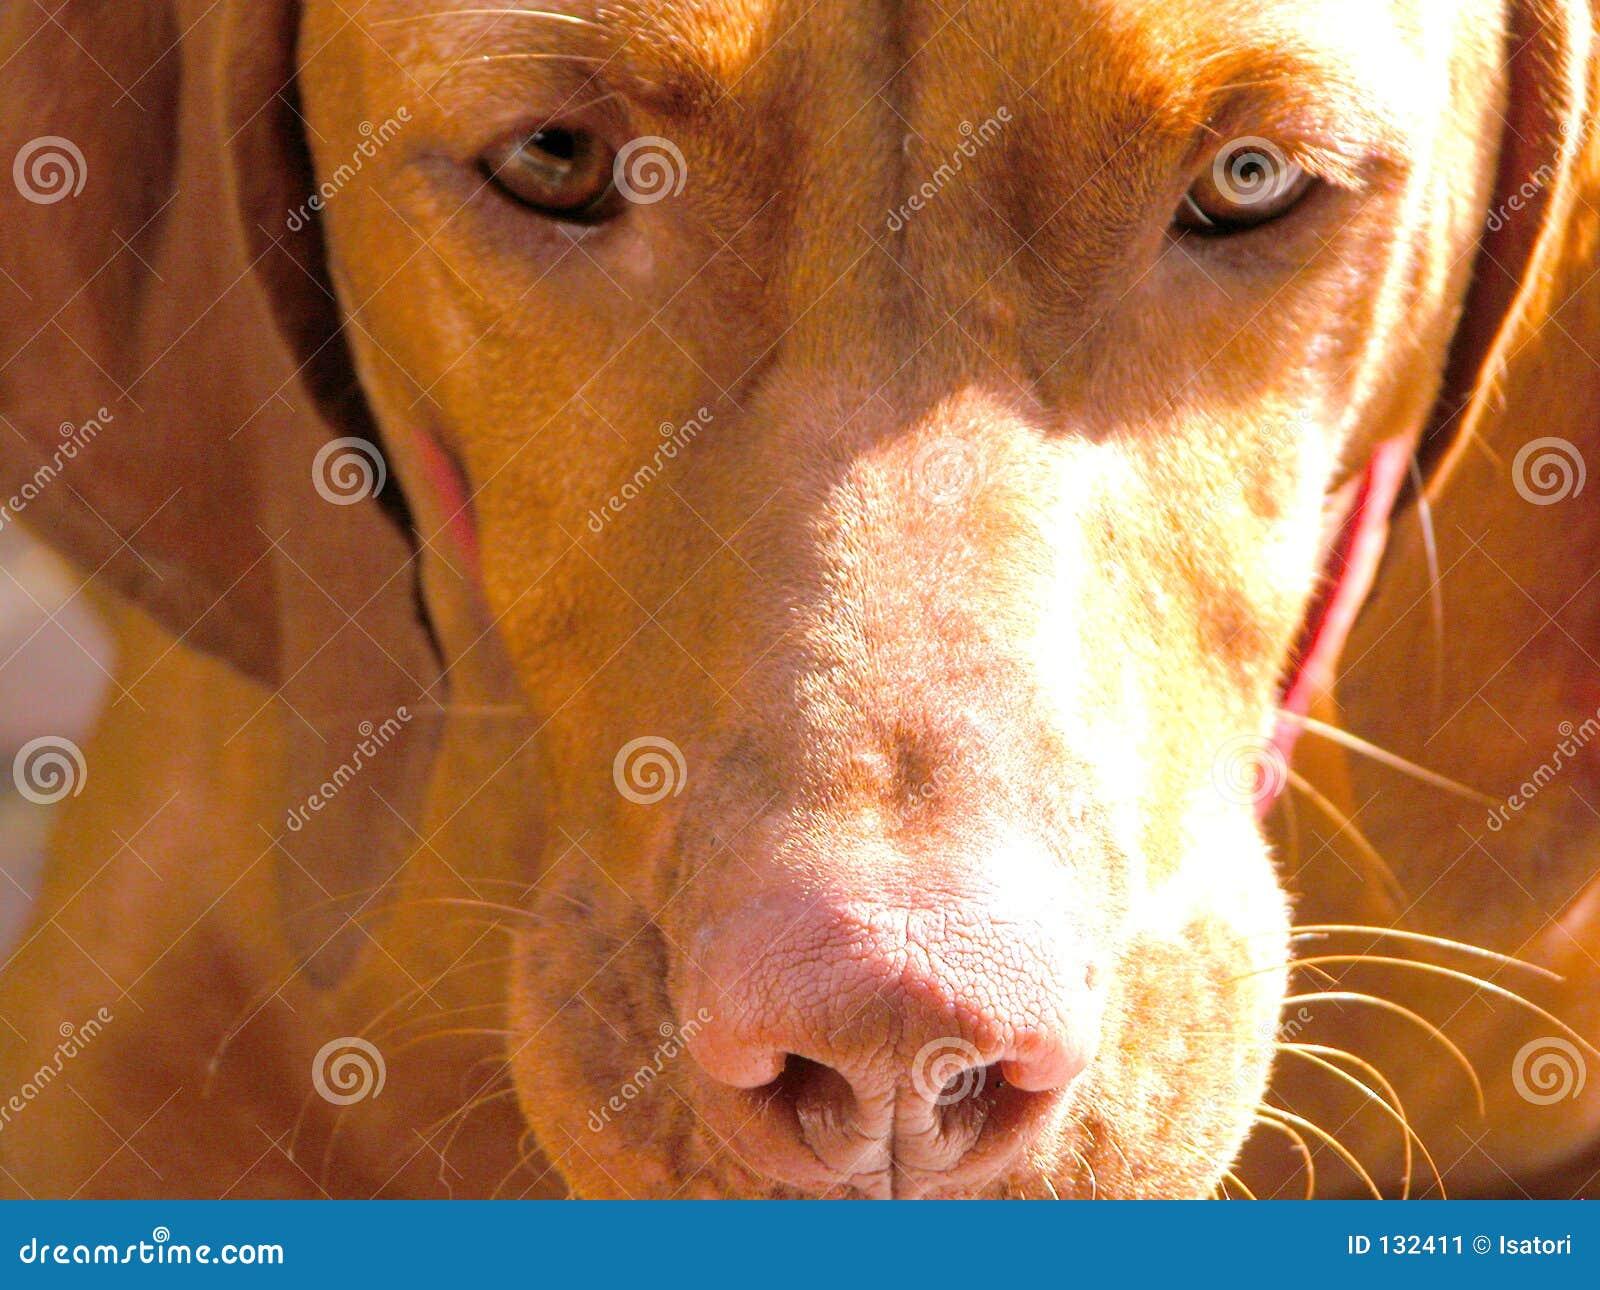 Vishler pup close up